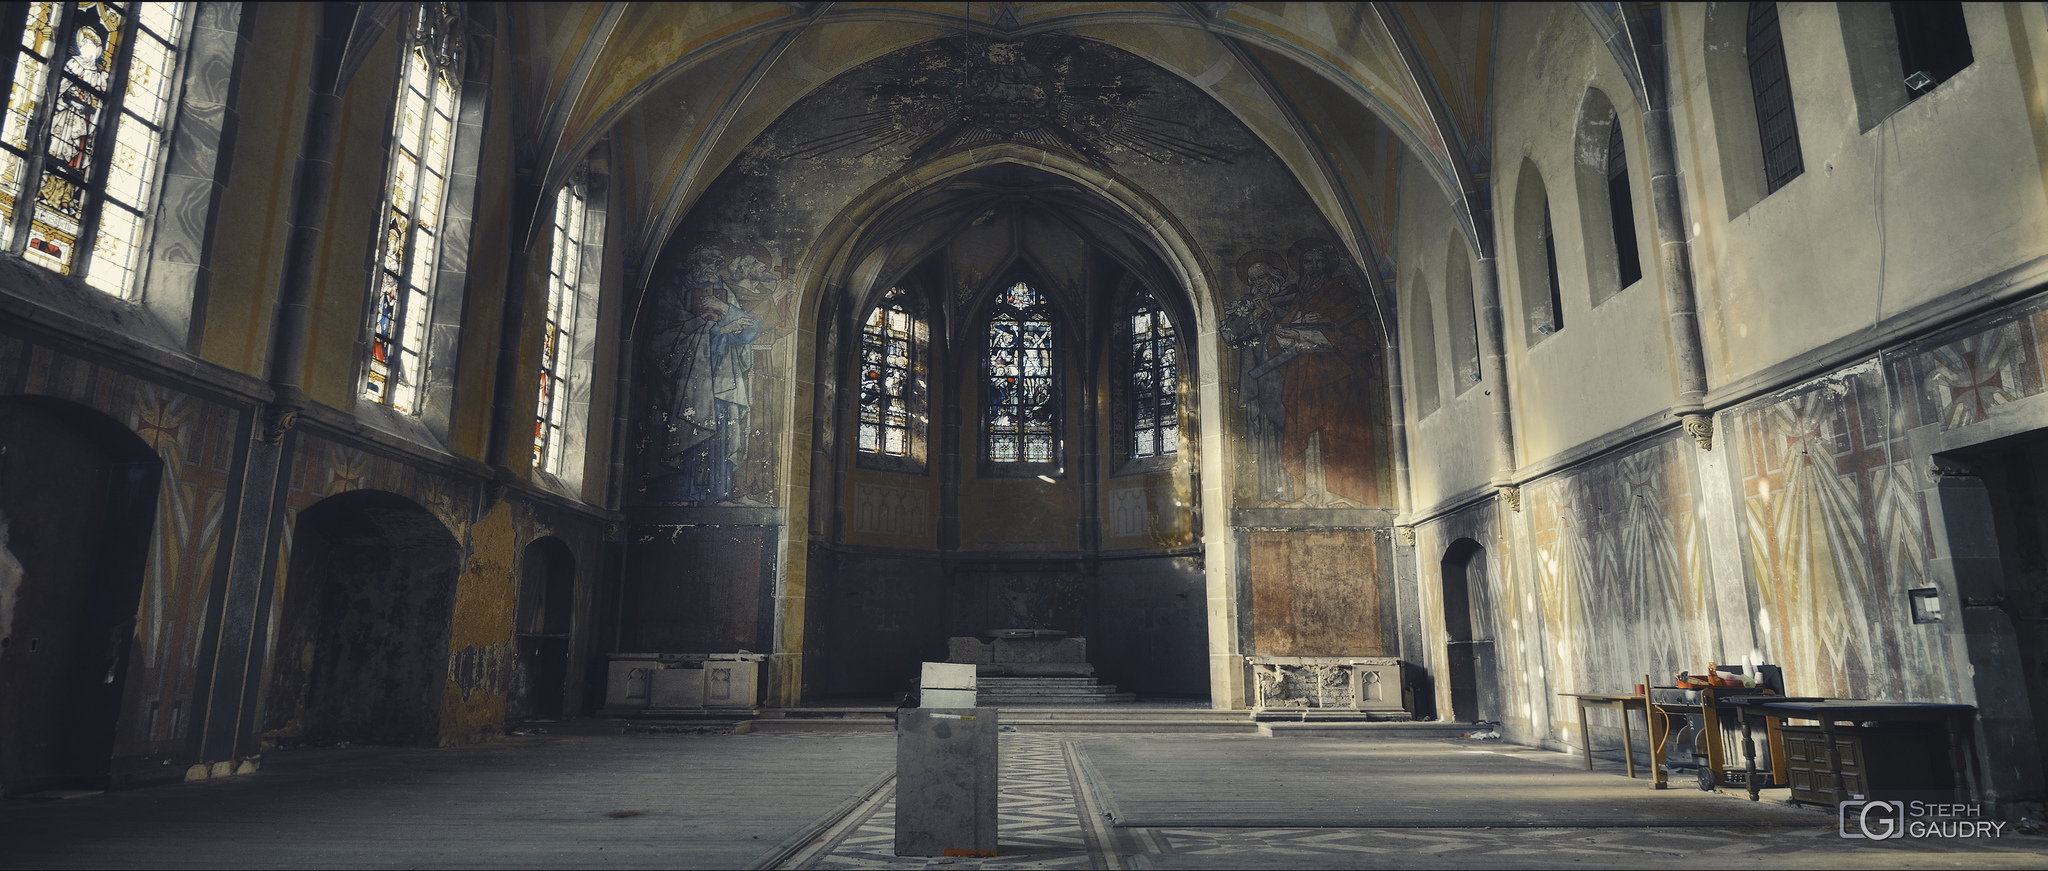 St. Josefsheims - cinemascope [Click to start slideshow]